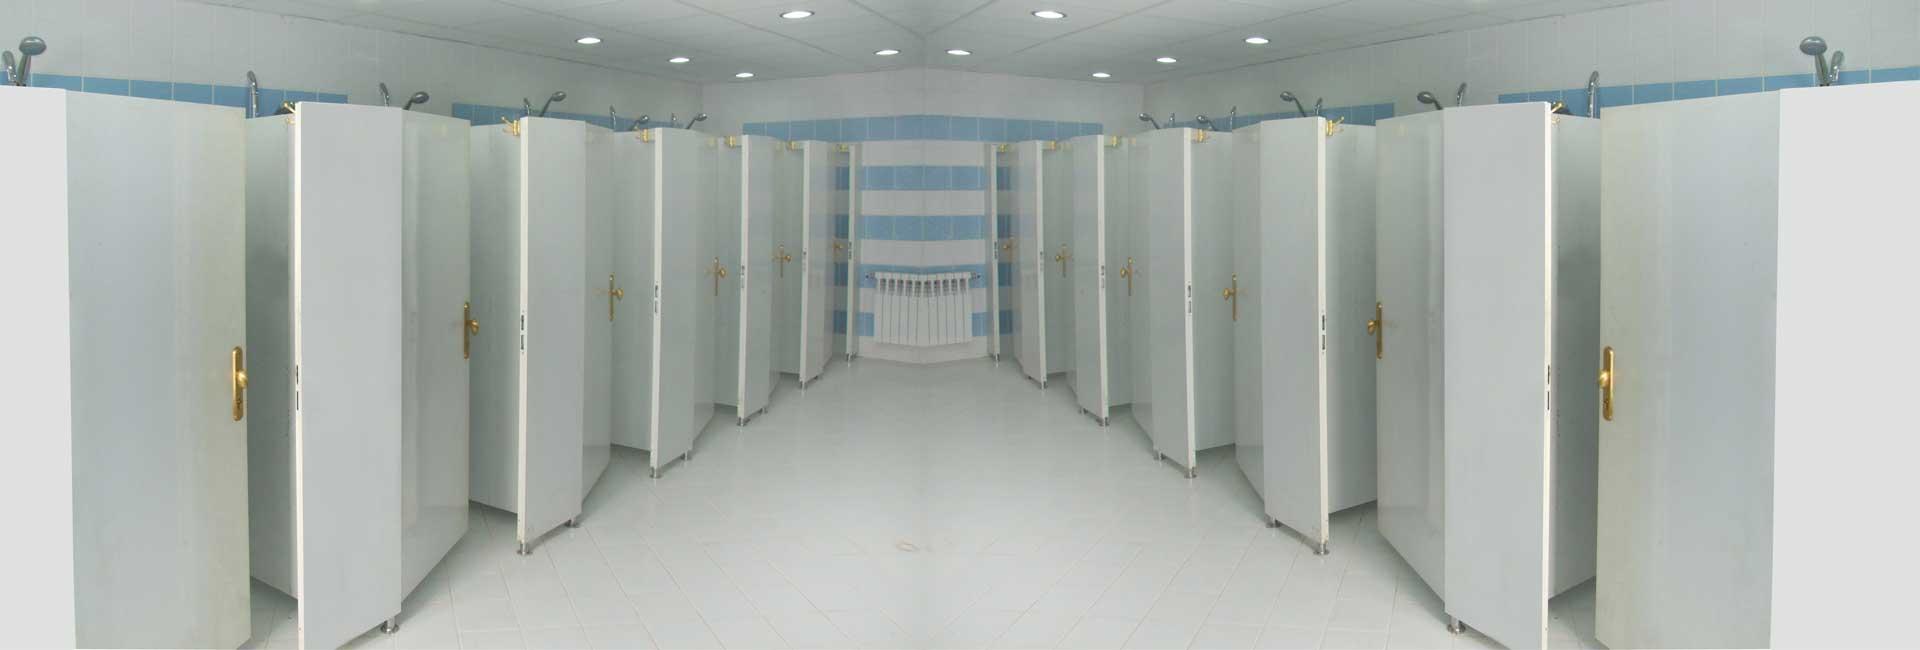 پارتیشن سرویس بهداشتی ضد آب